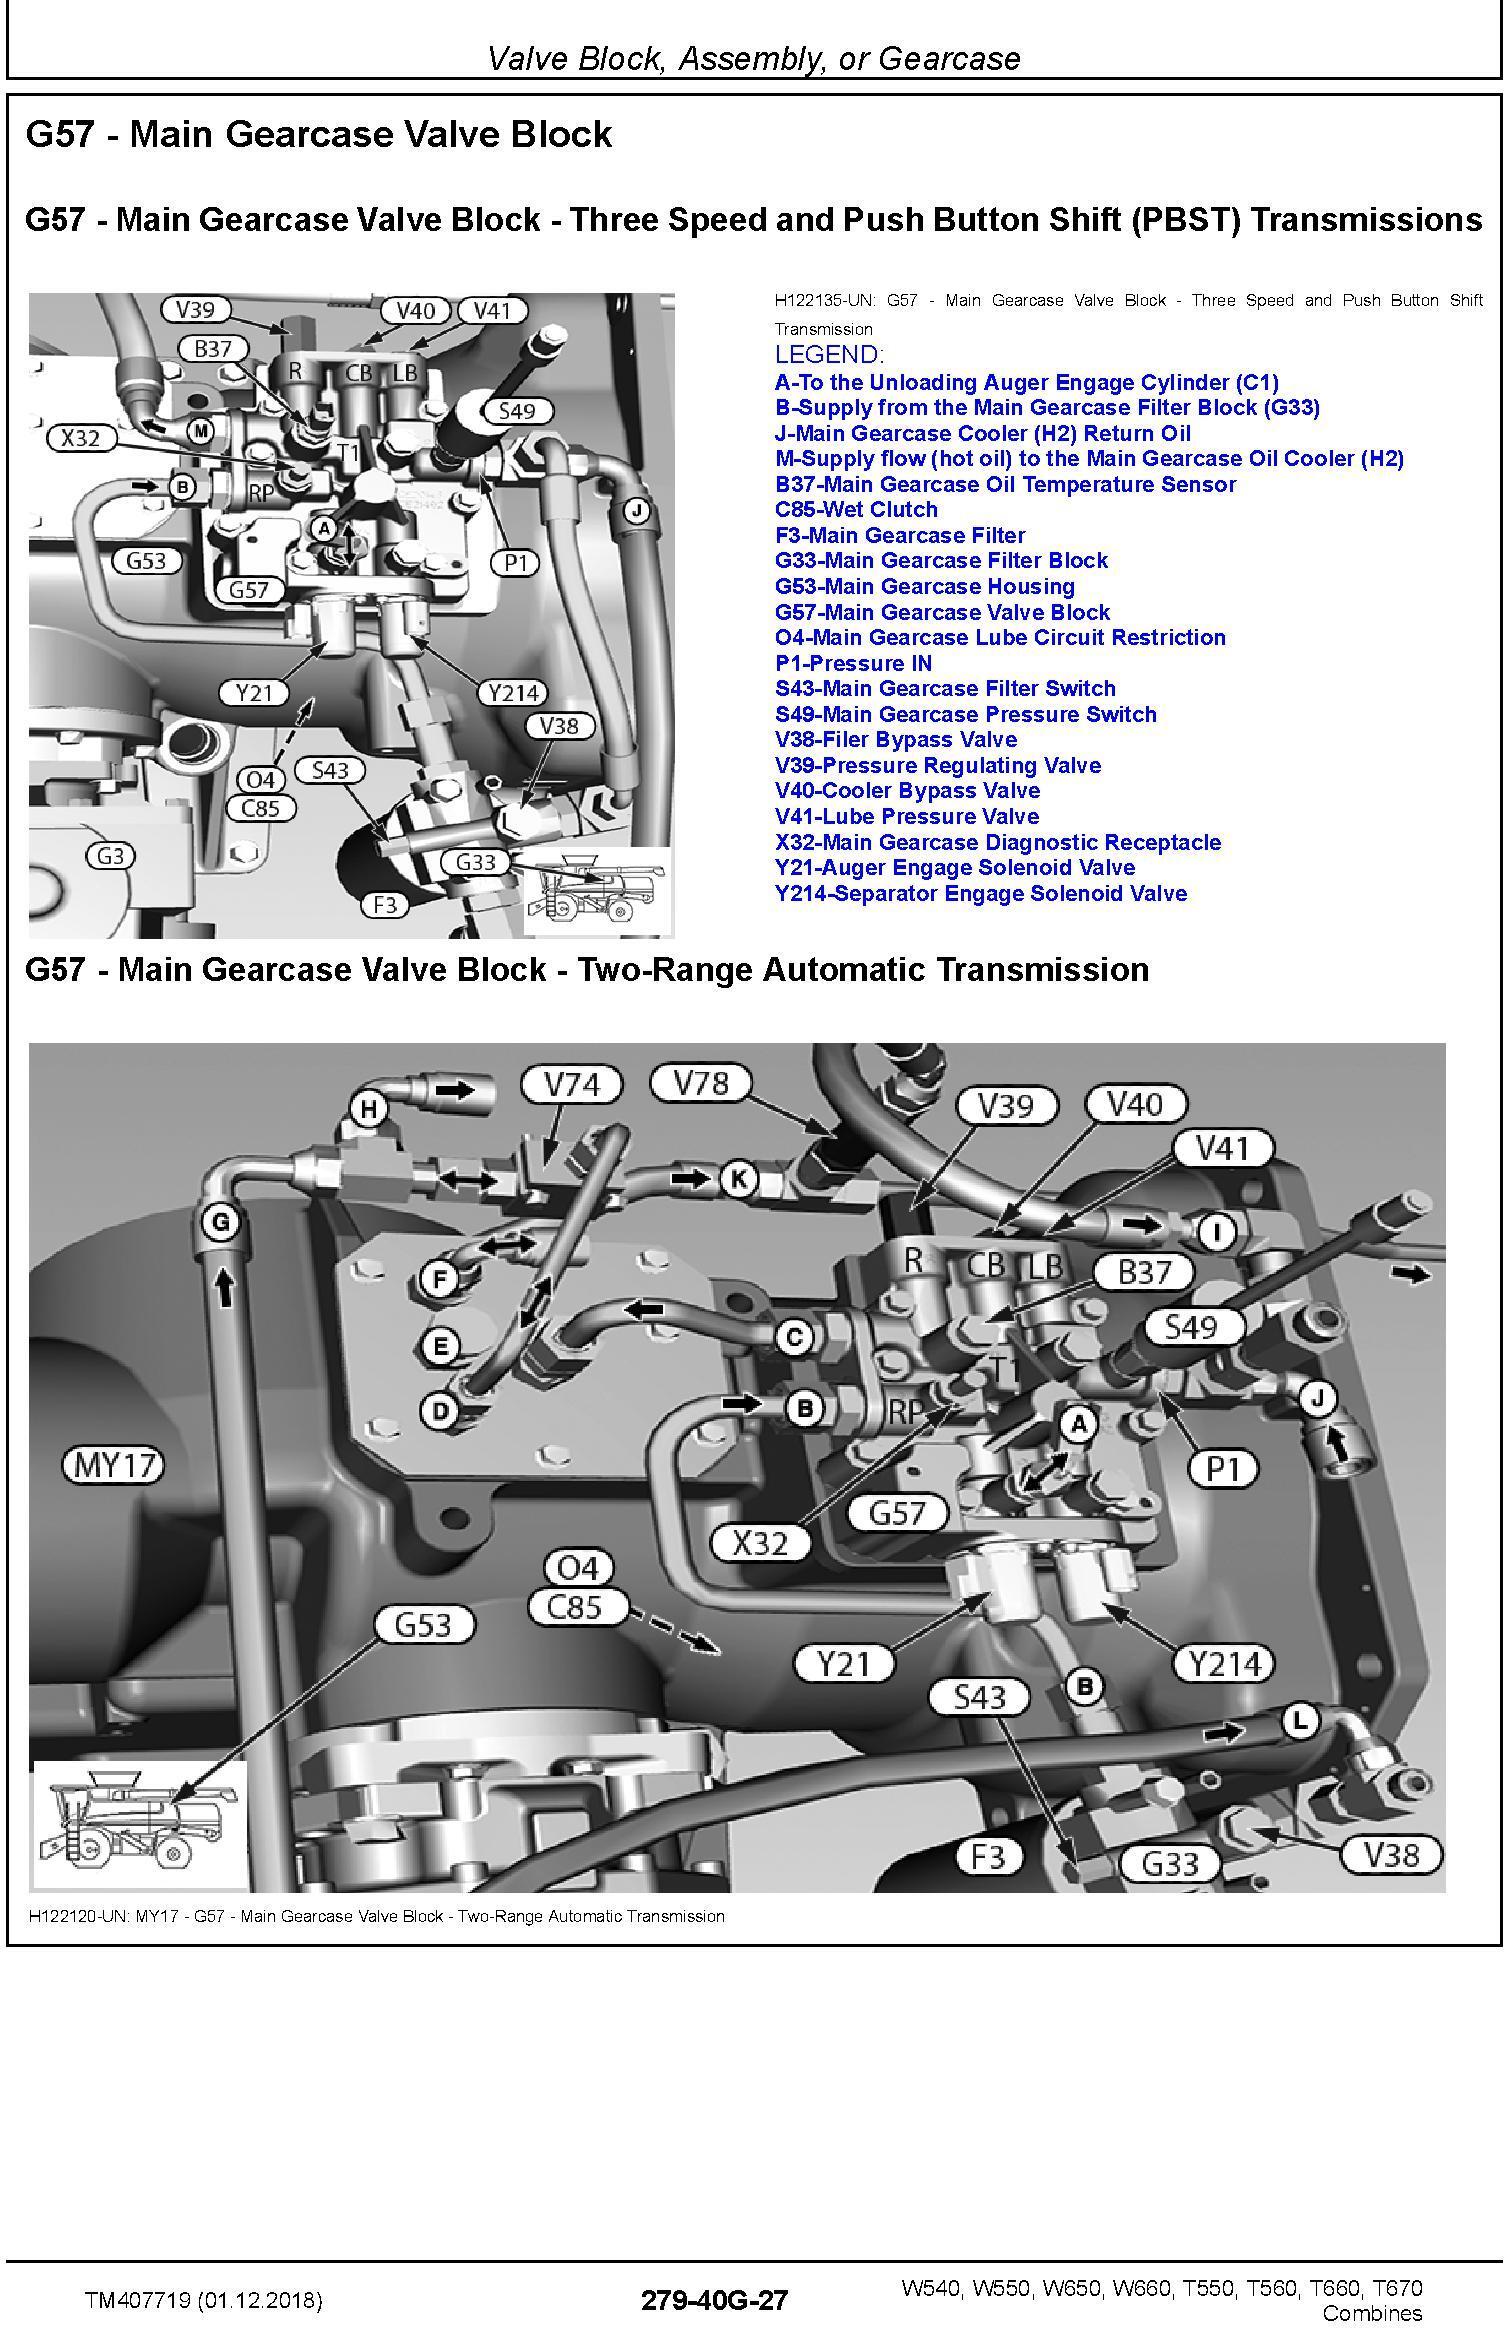 John Deere W540 W550 W650 W660, T550 T560 T660 T670 Combines Diagnostic Technical Manual (TM407719) - 3